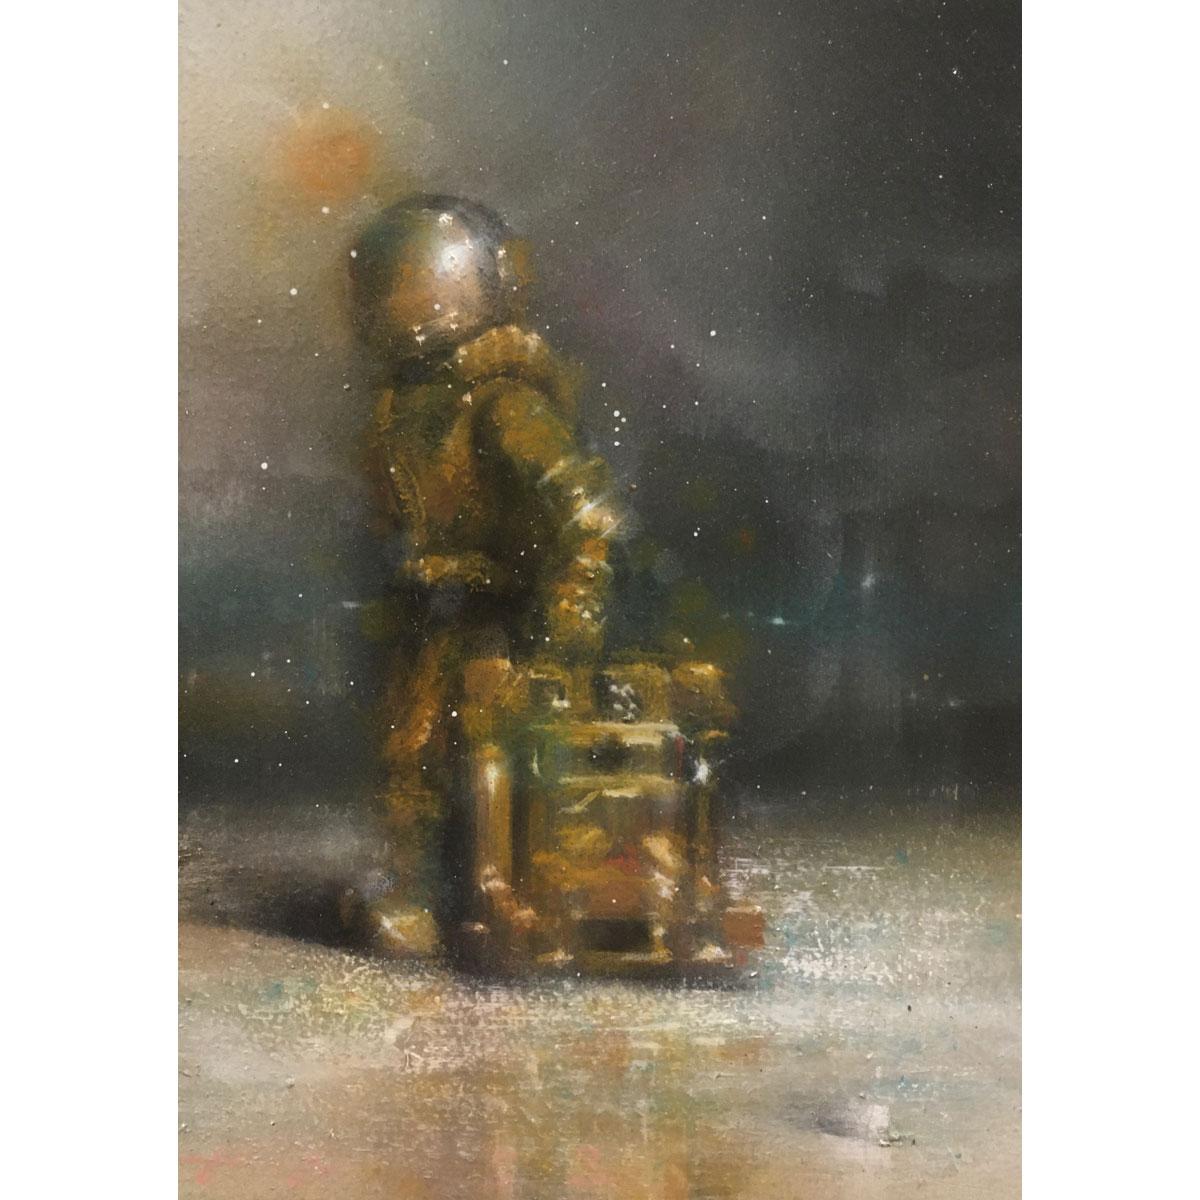 Nomad by C.J. Hales